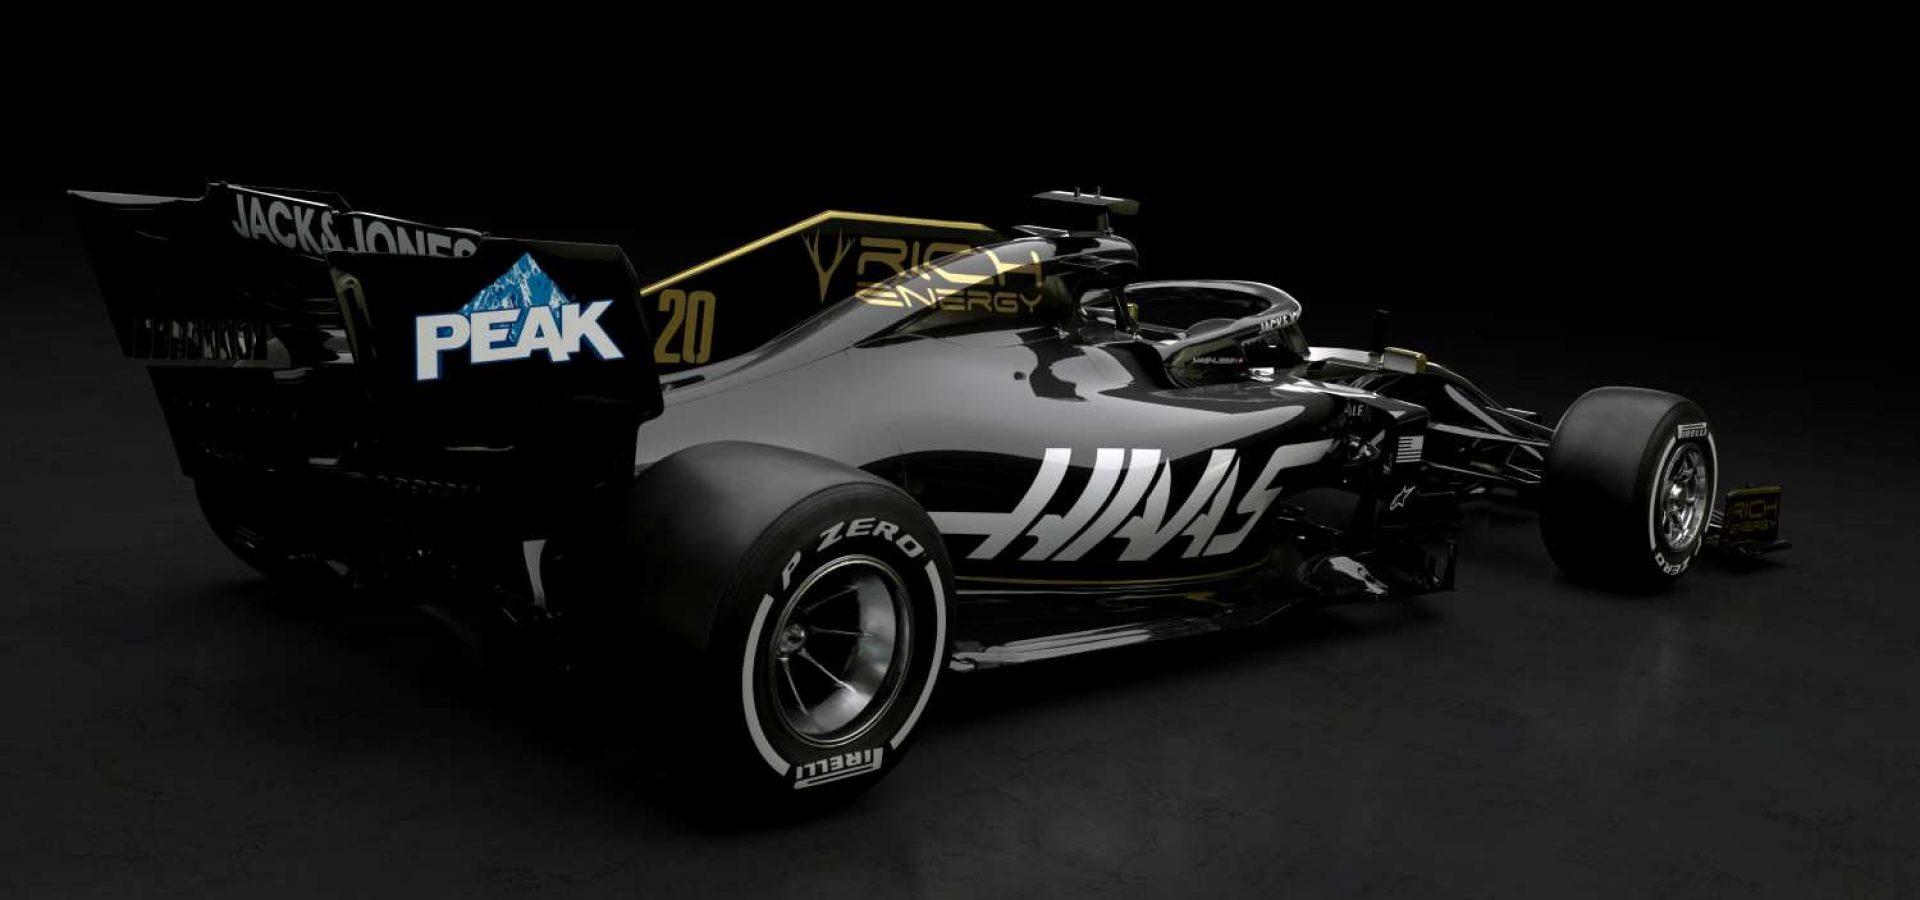 Fotó: Haas F1 Team